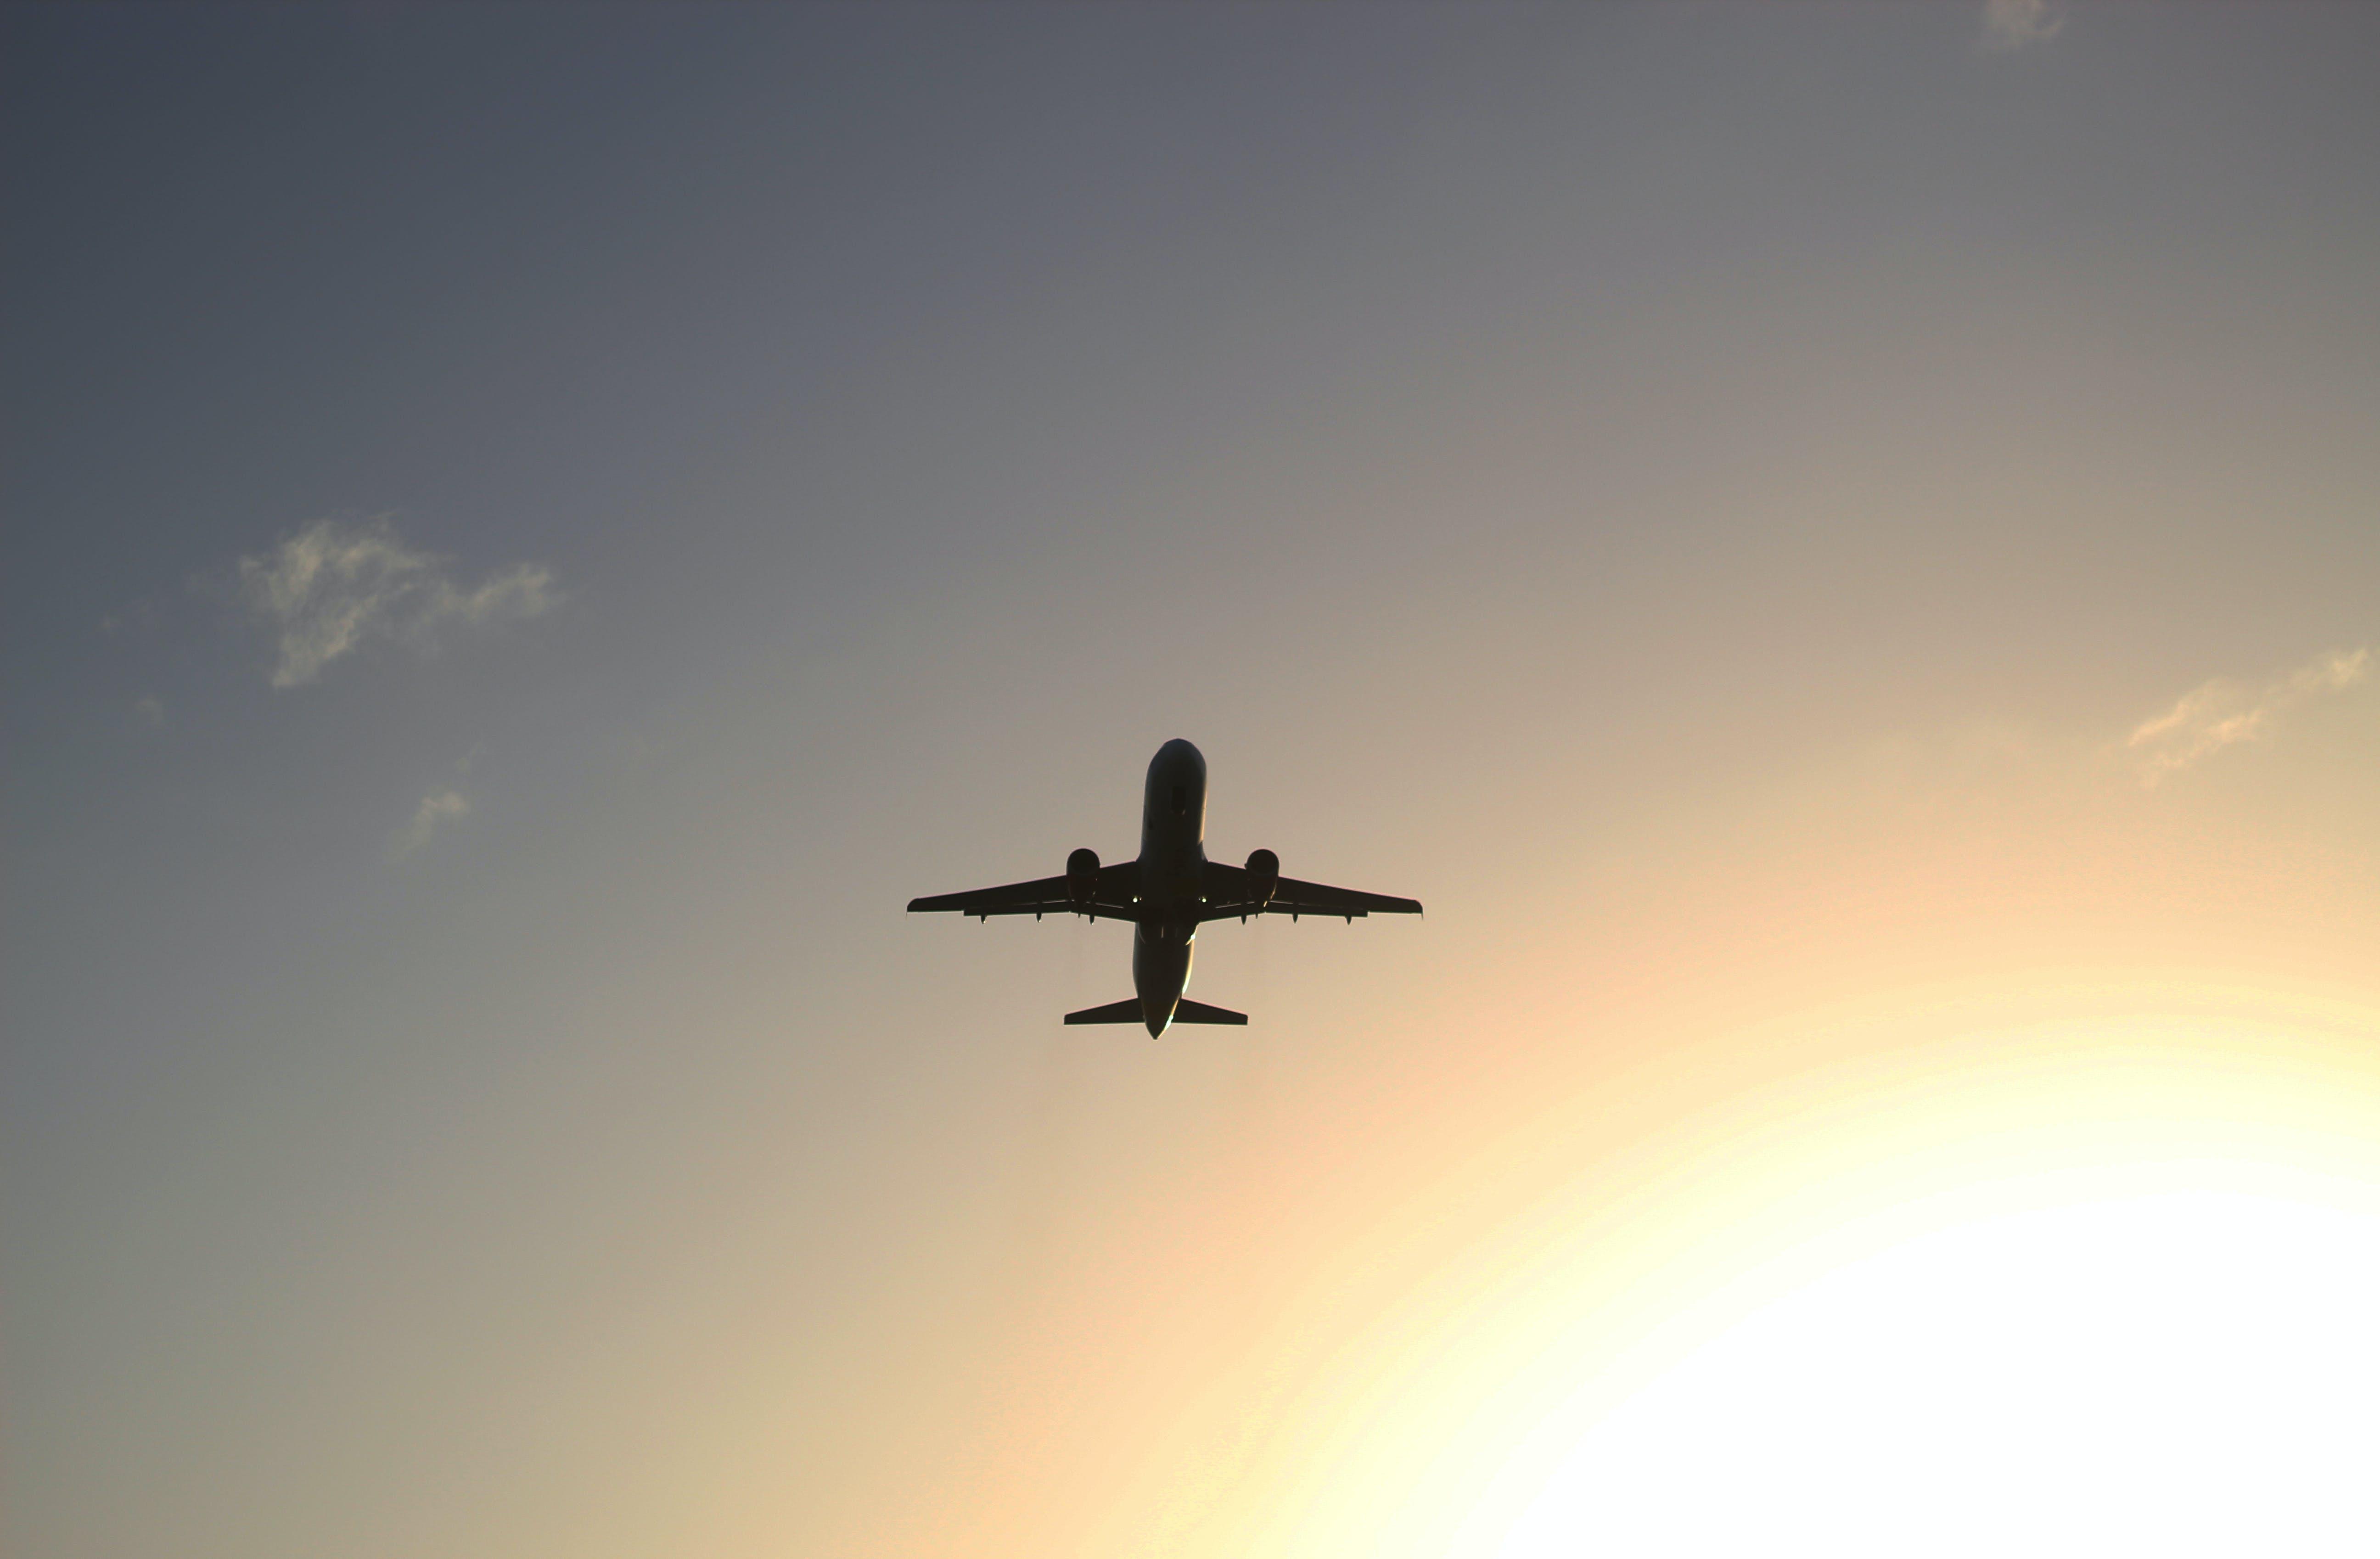 Photo of Airplane on Flight